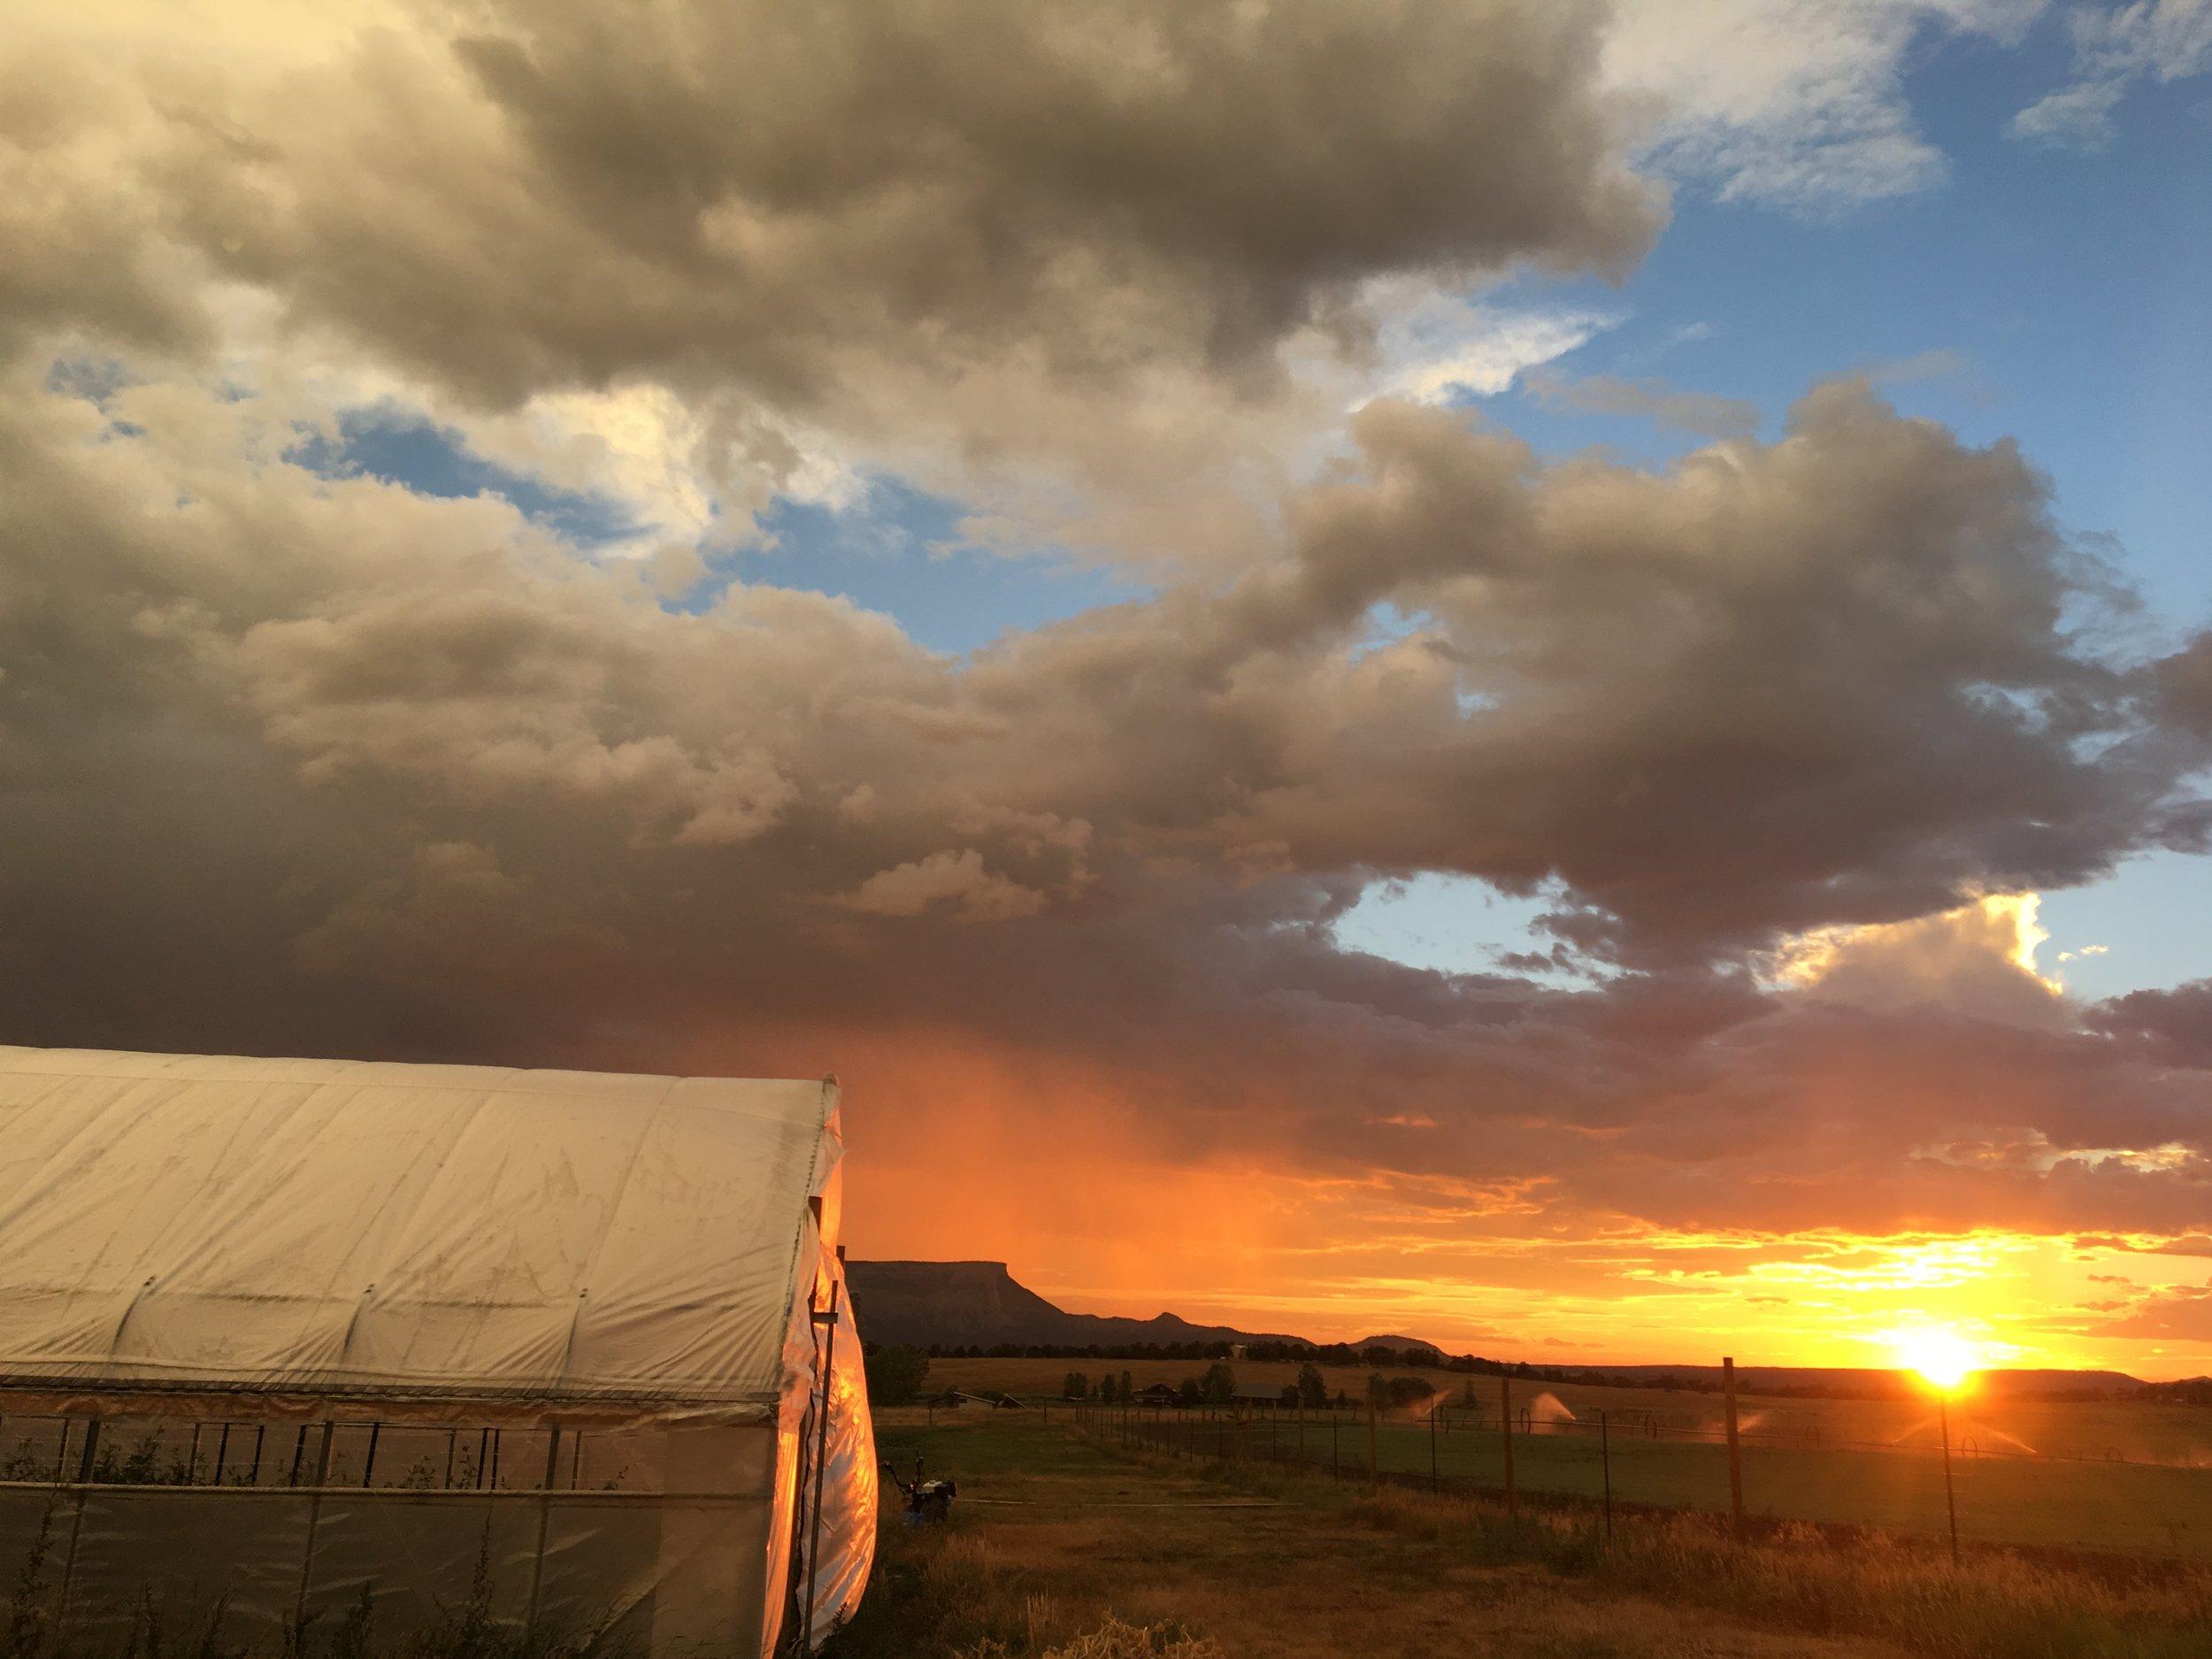 Sunset post rain storm, so incredible.